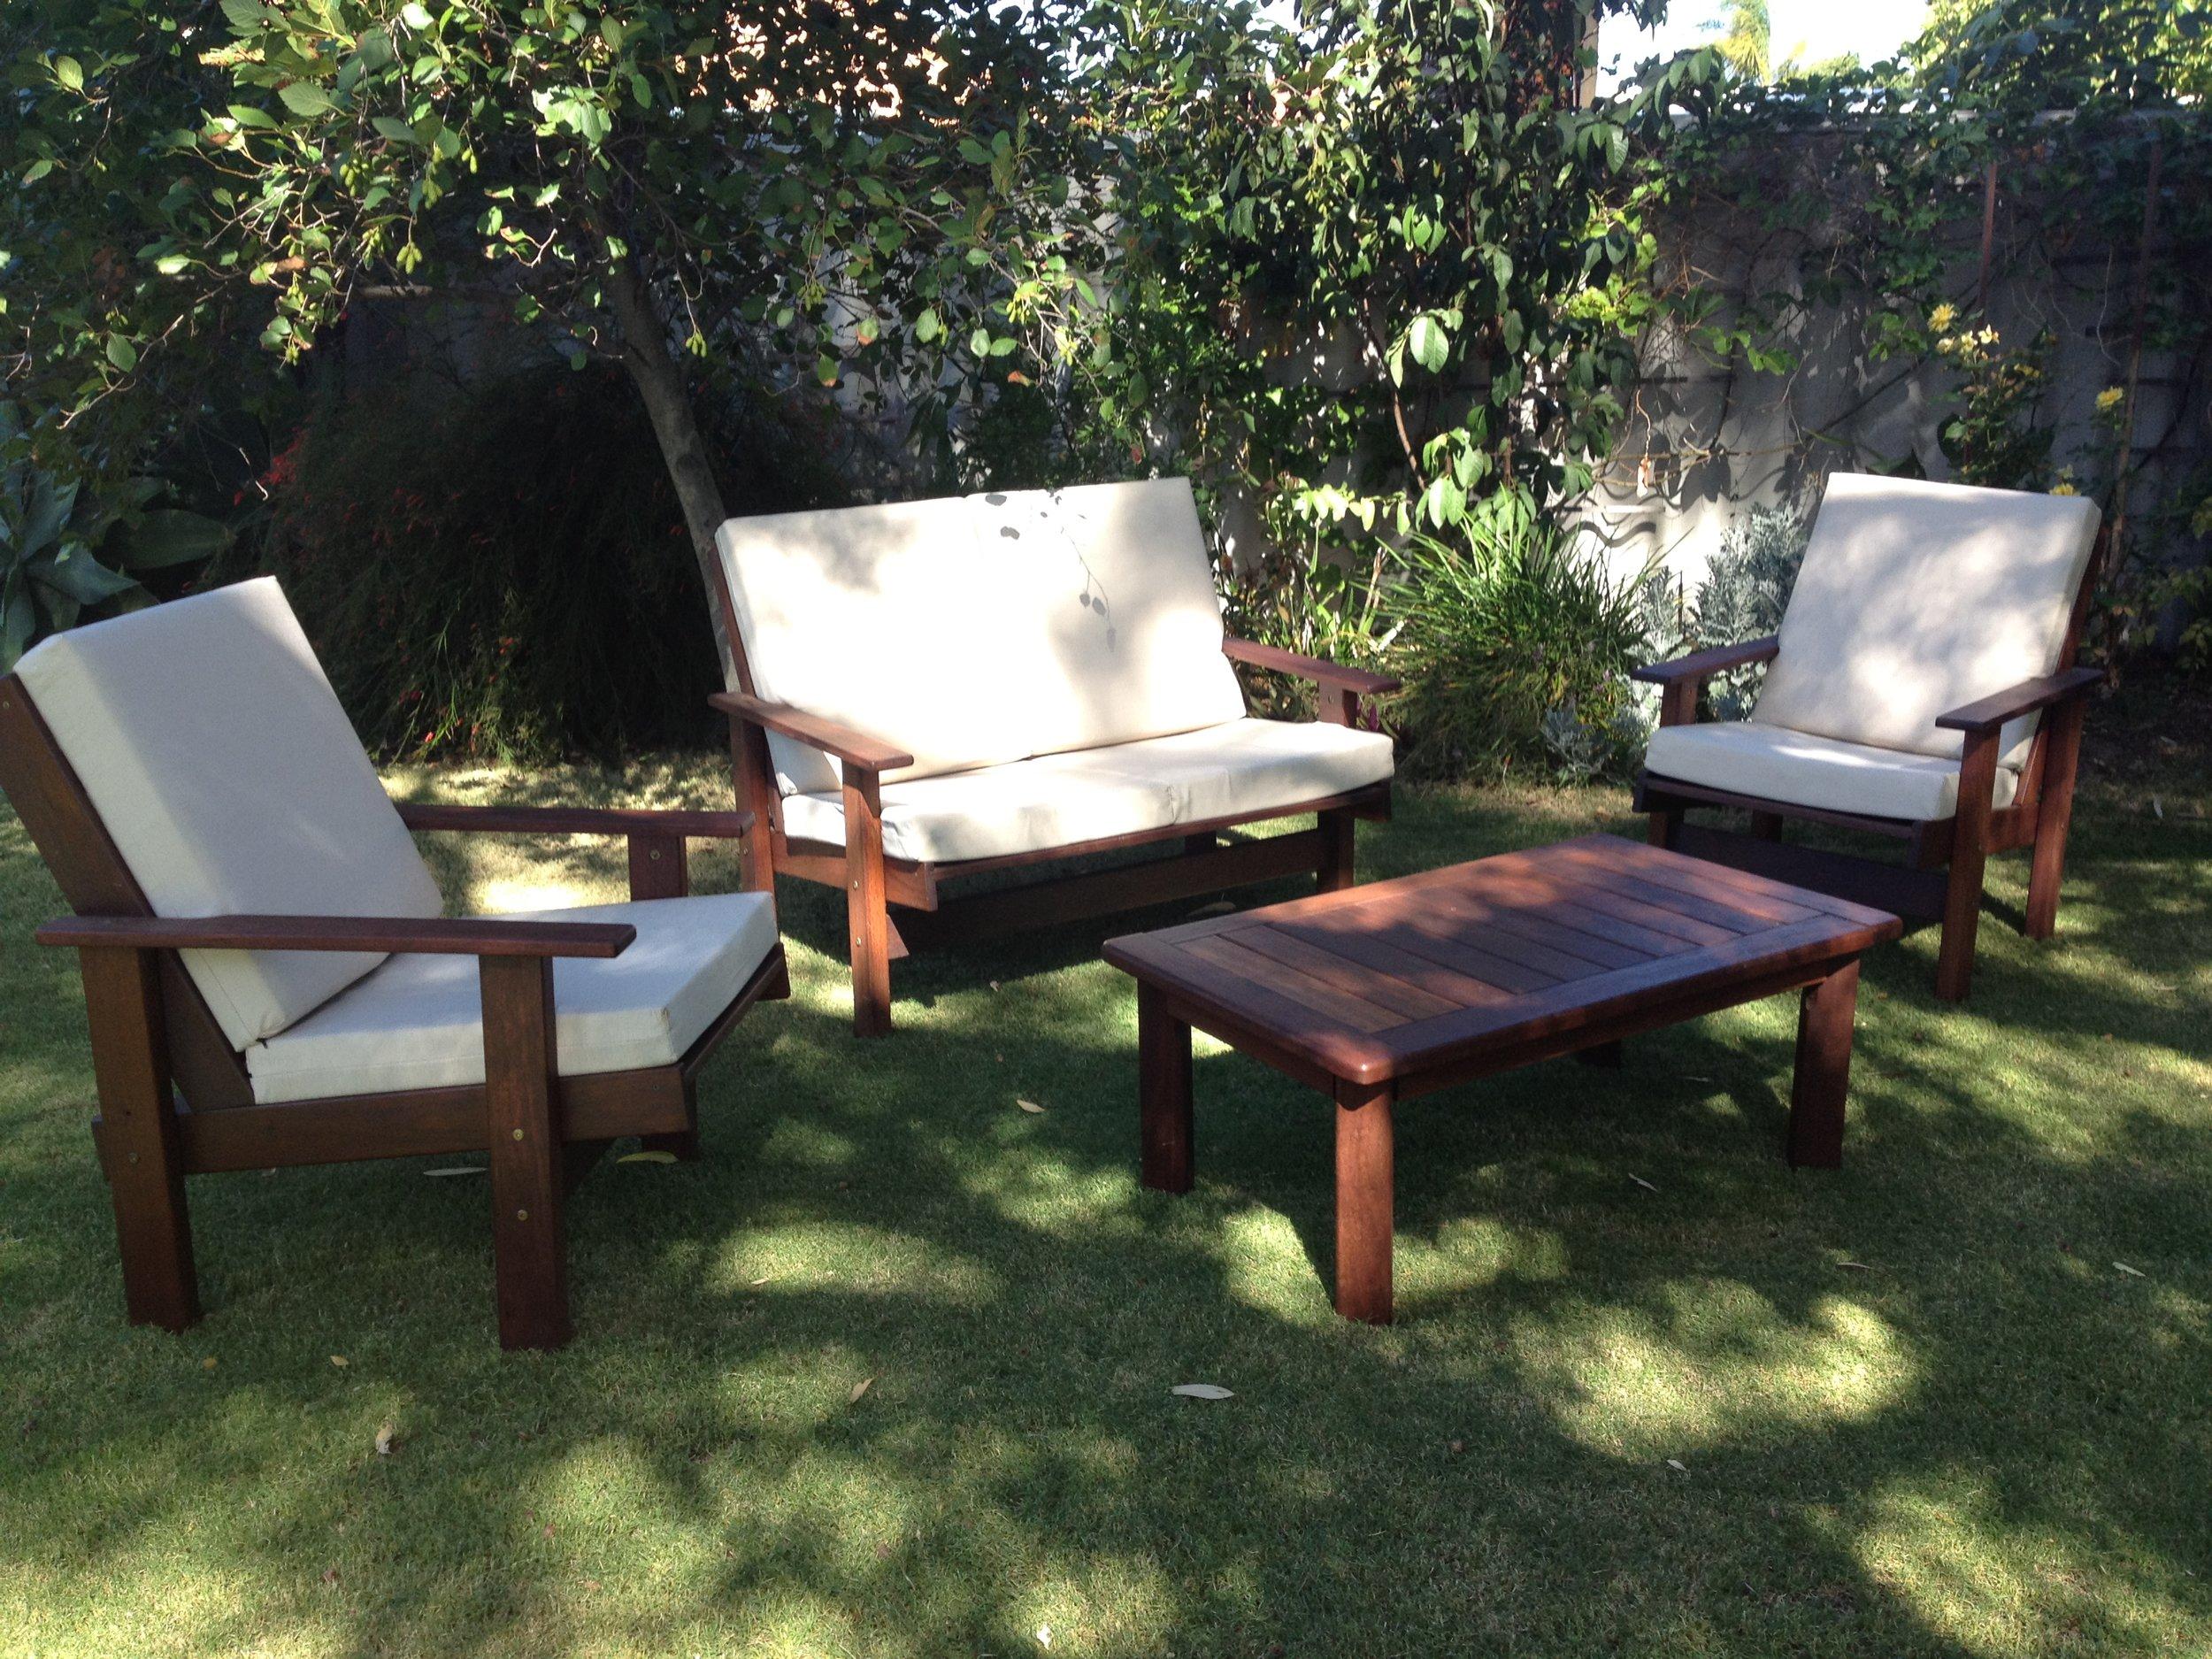 q7 -Sue cahirs [Morris style] outdoor lounge set.JPG